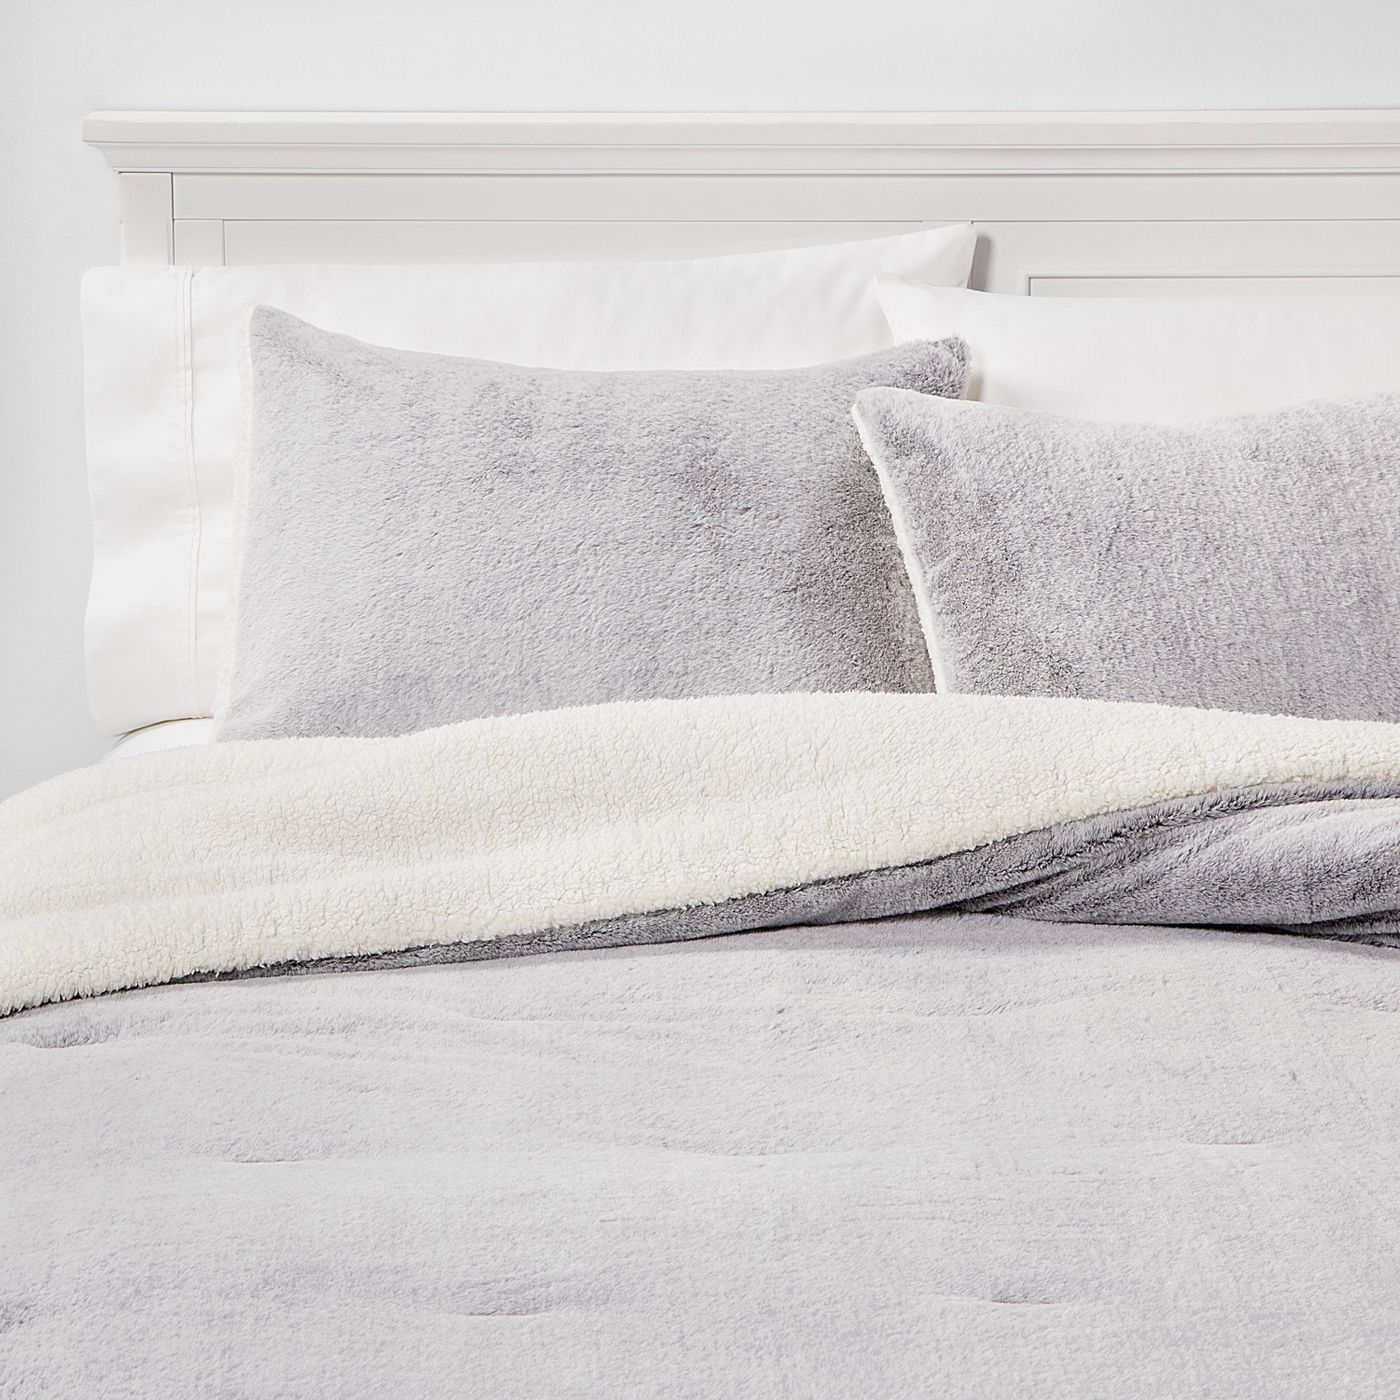 Aspen Faux Fur Comforter & Sham Set - image 1 of 3